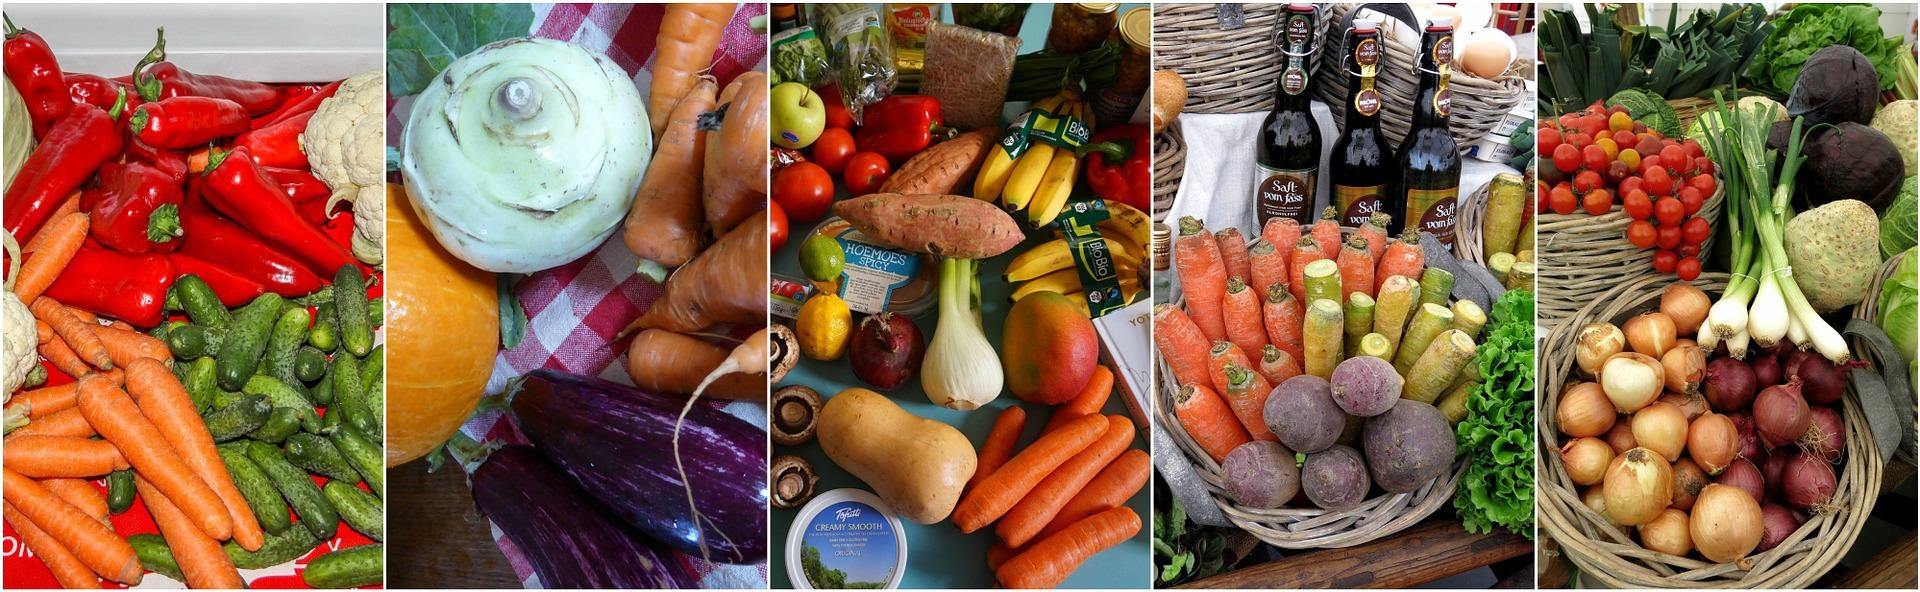 vegetables-9.jpg